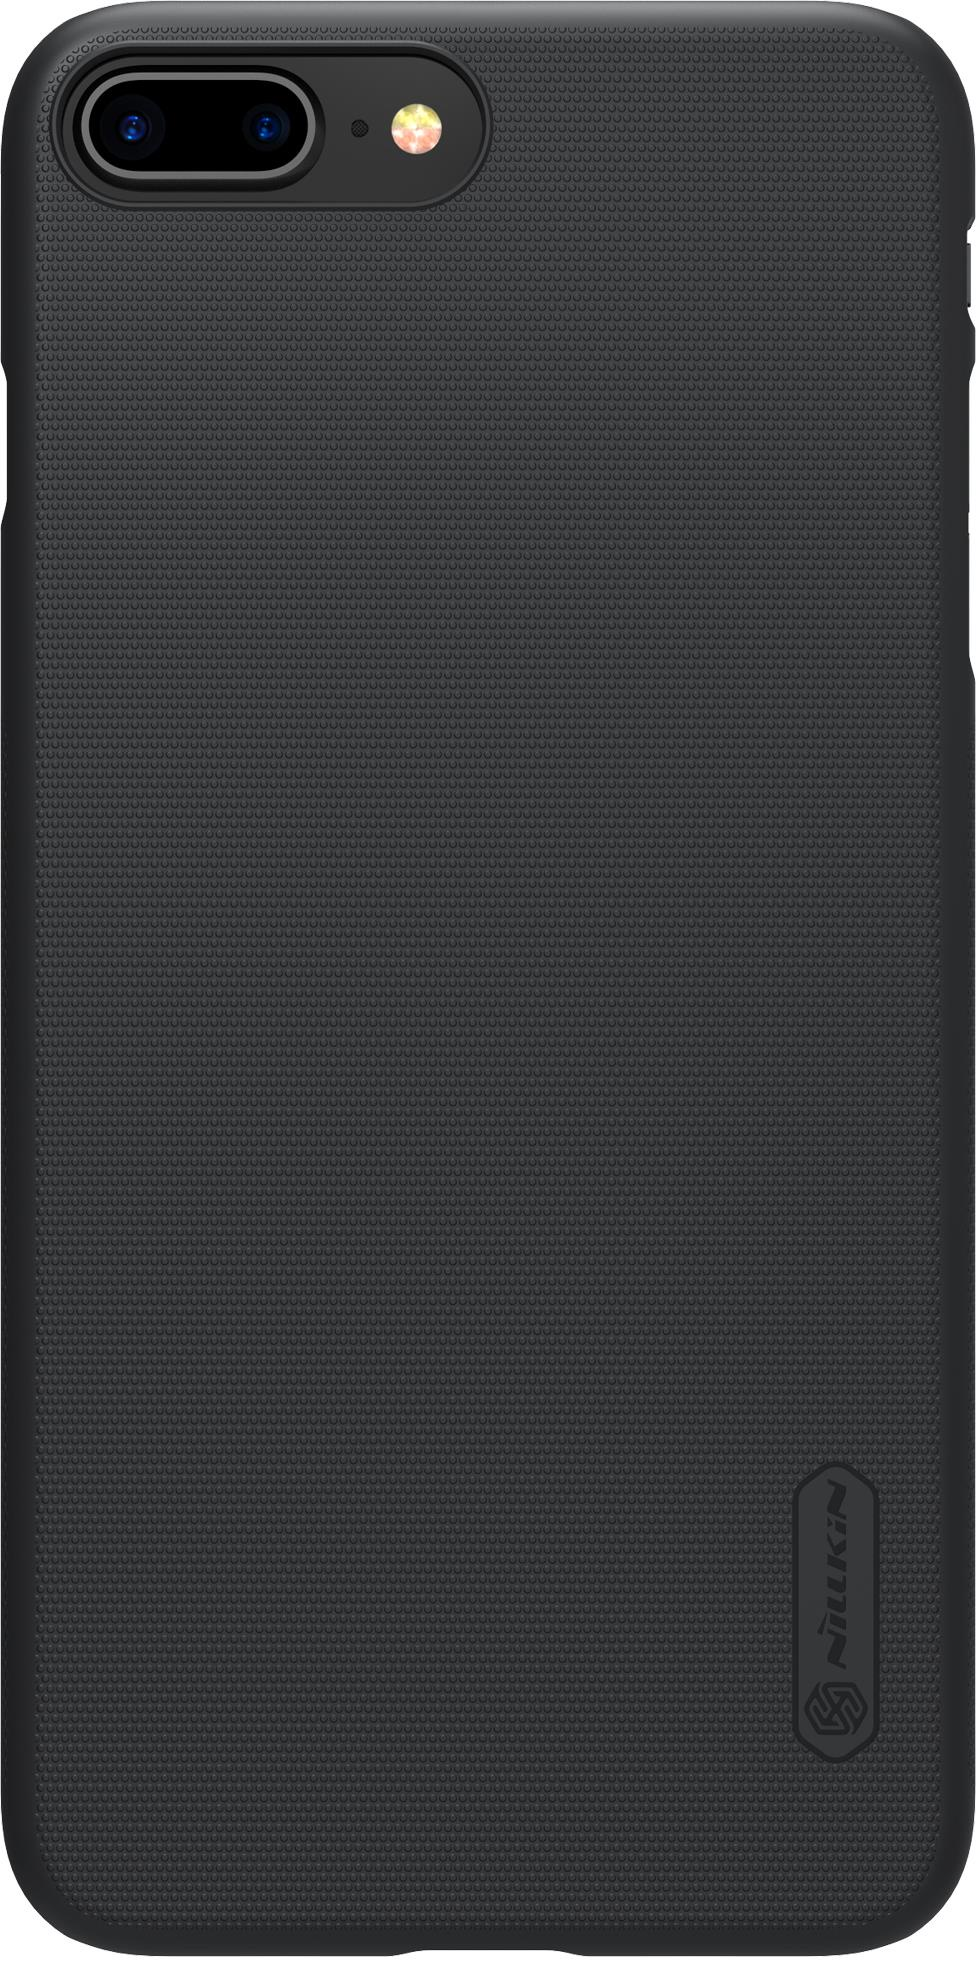 Накладка Nillkin Super Frosted для iPhone 8+, 6902048148147, черный